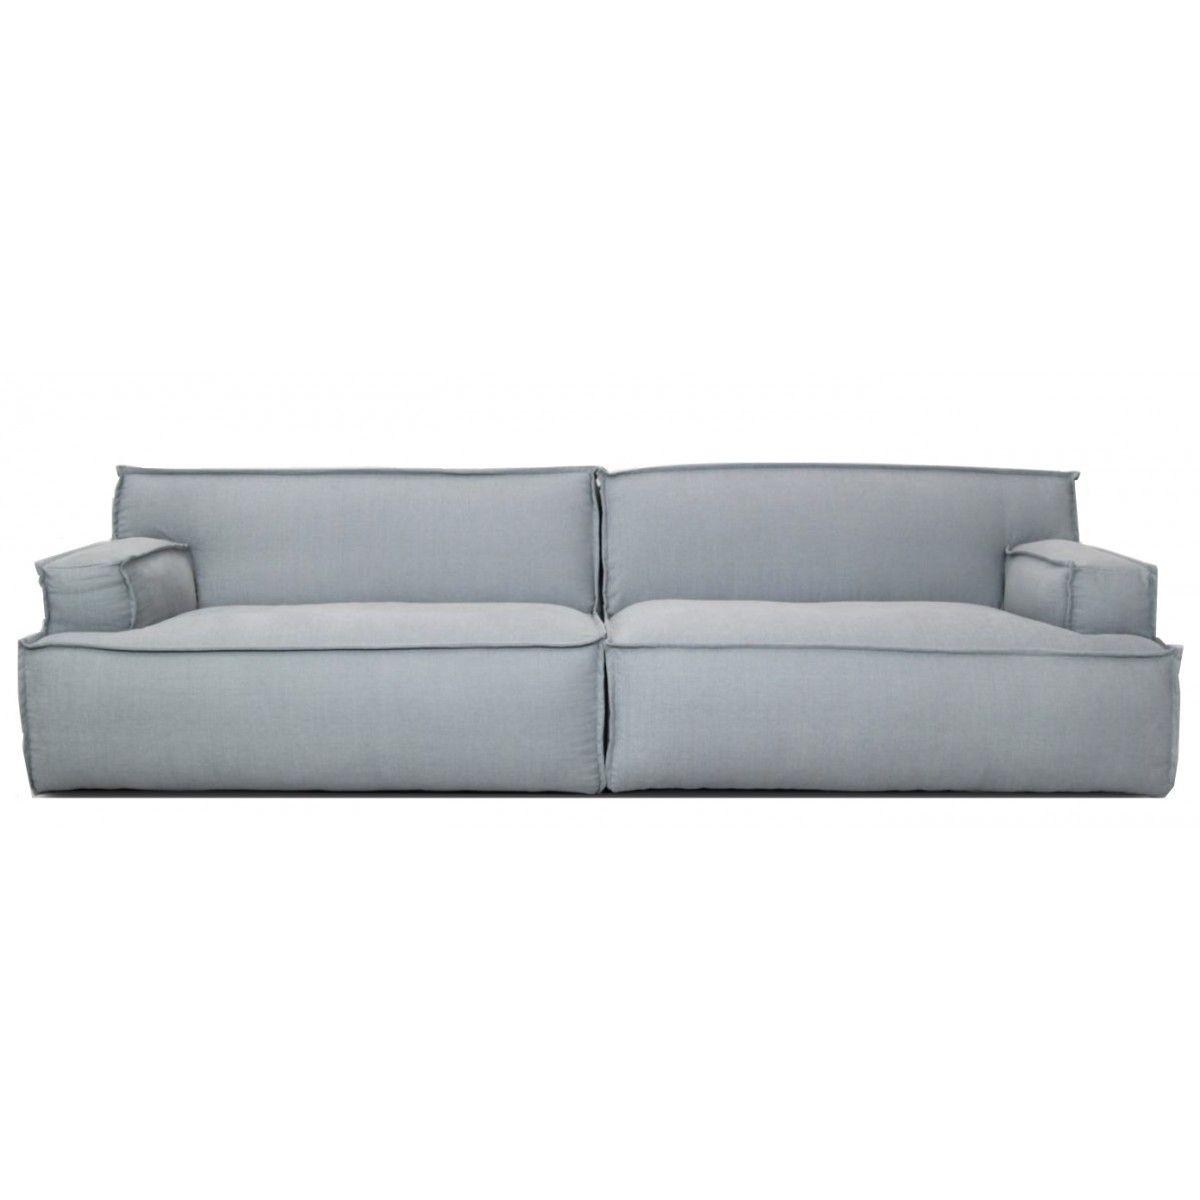 barletta sofa chenille cats bank le noir baron stof elementen f 沙发 pinterest